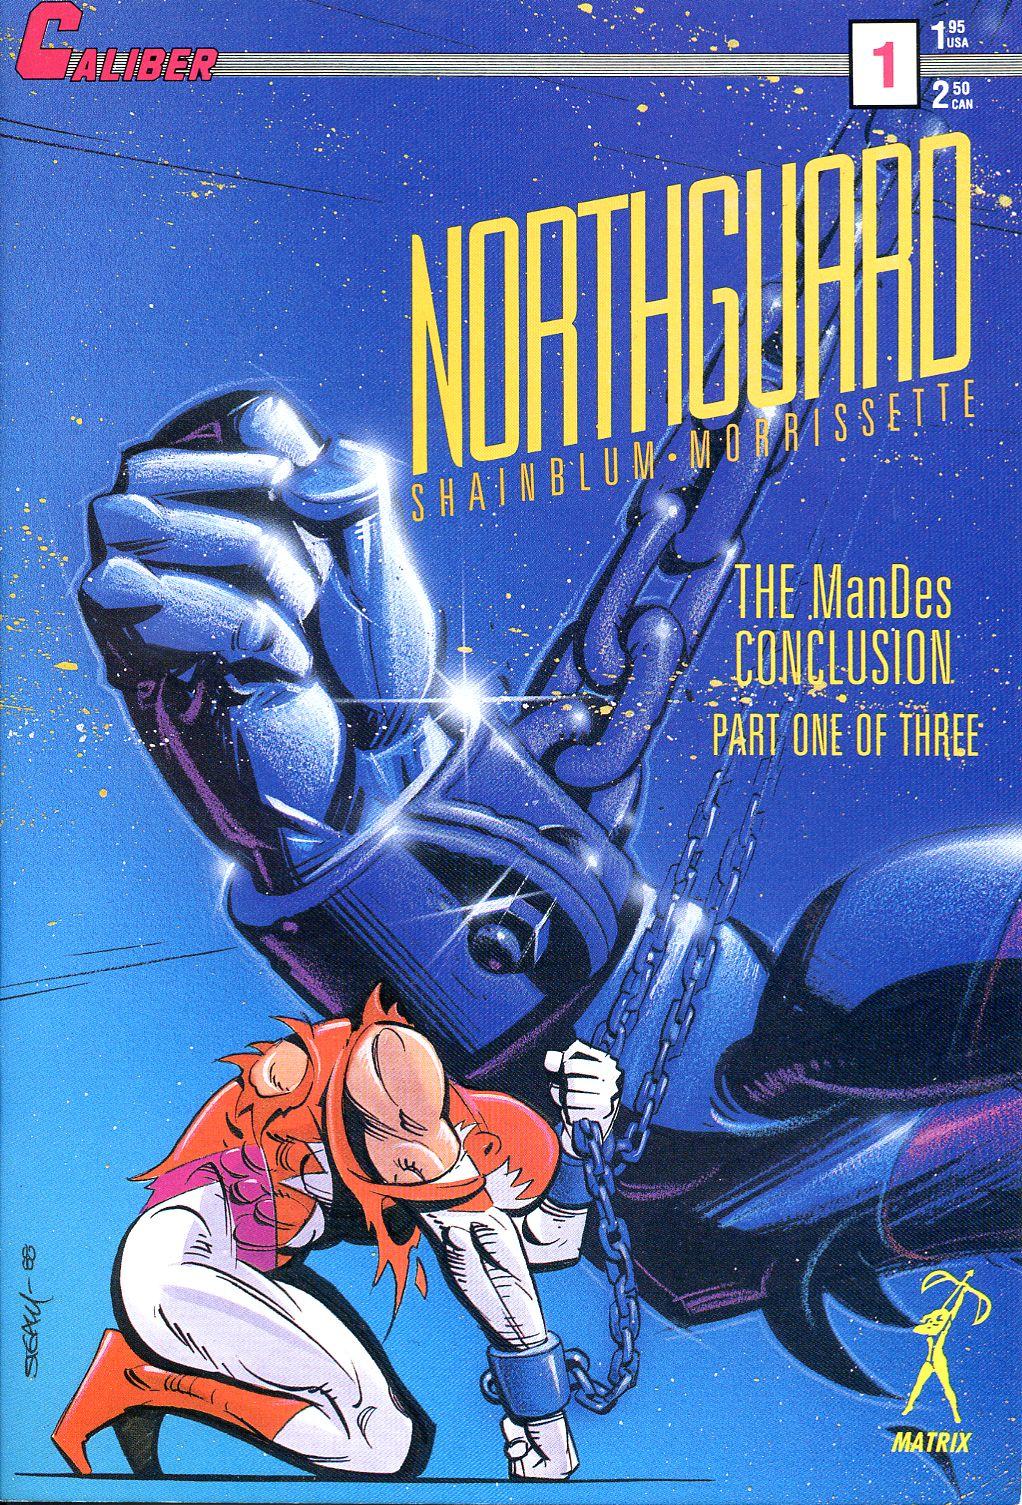 Mark Shainblum & Gabriel Morrissette - Northguard series